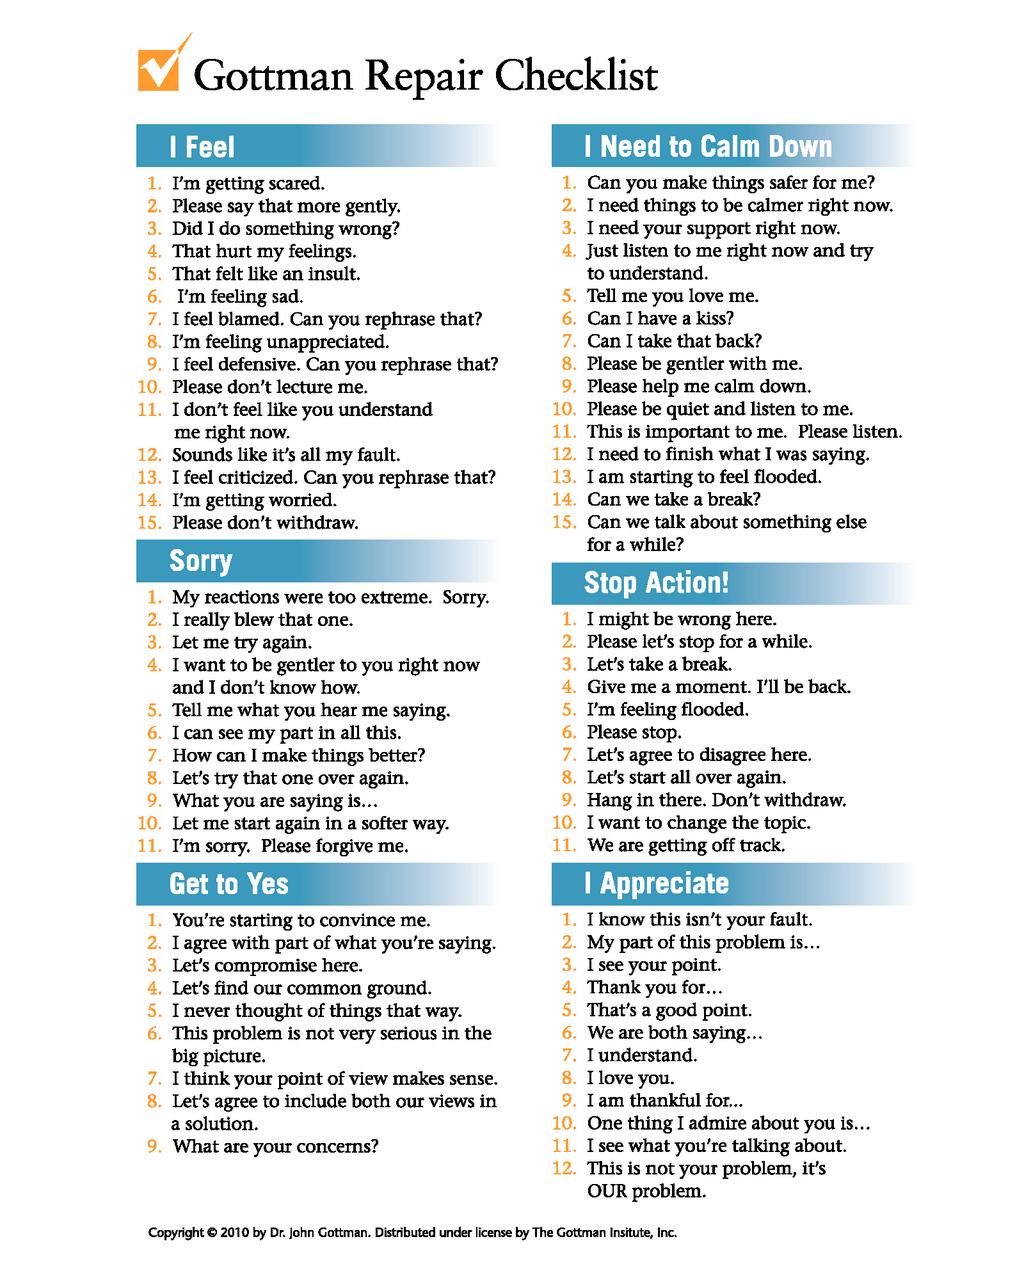 Psychologist John Gottman S Relationship Repair Checklist Zenhabits